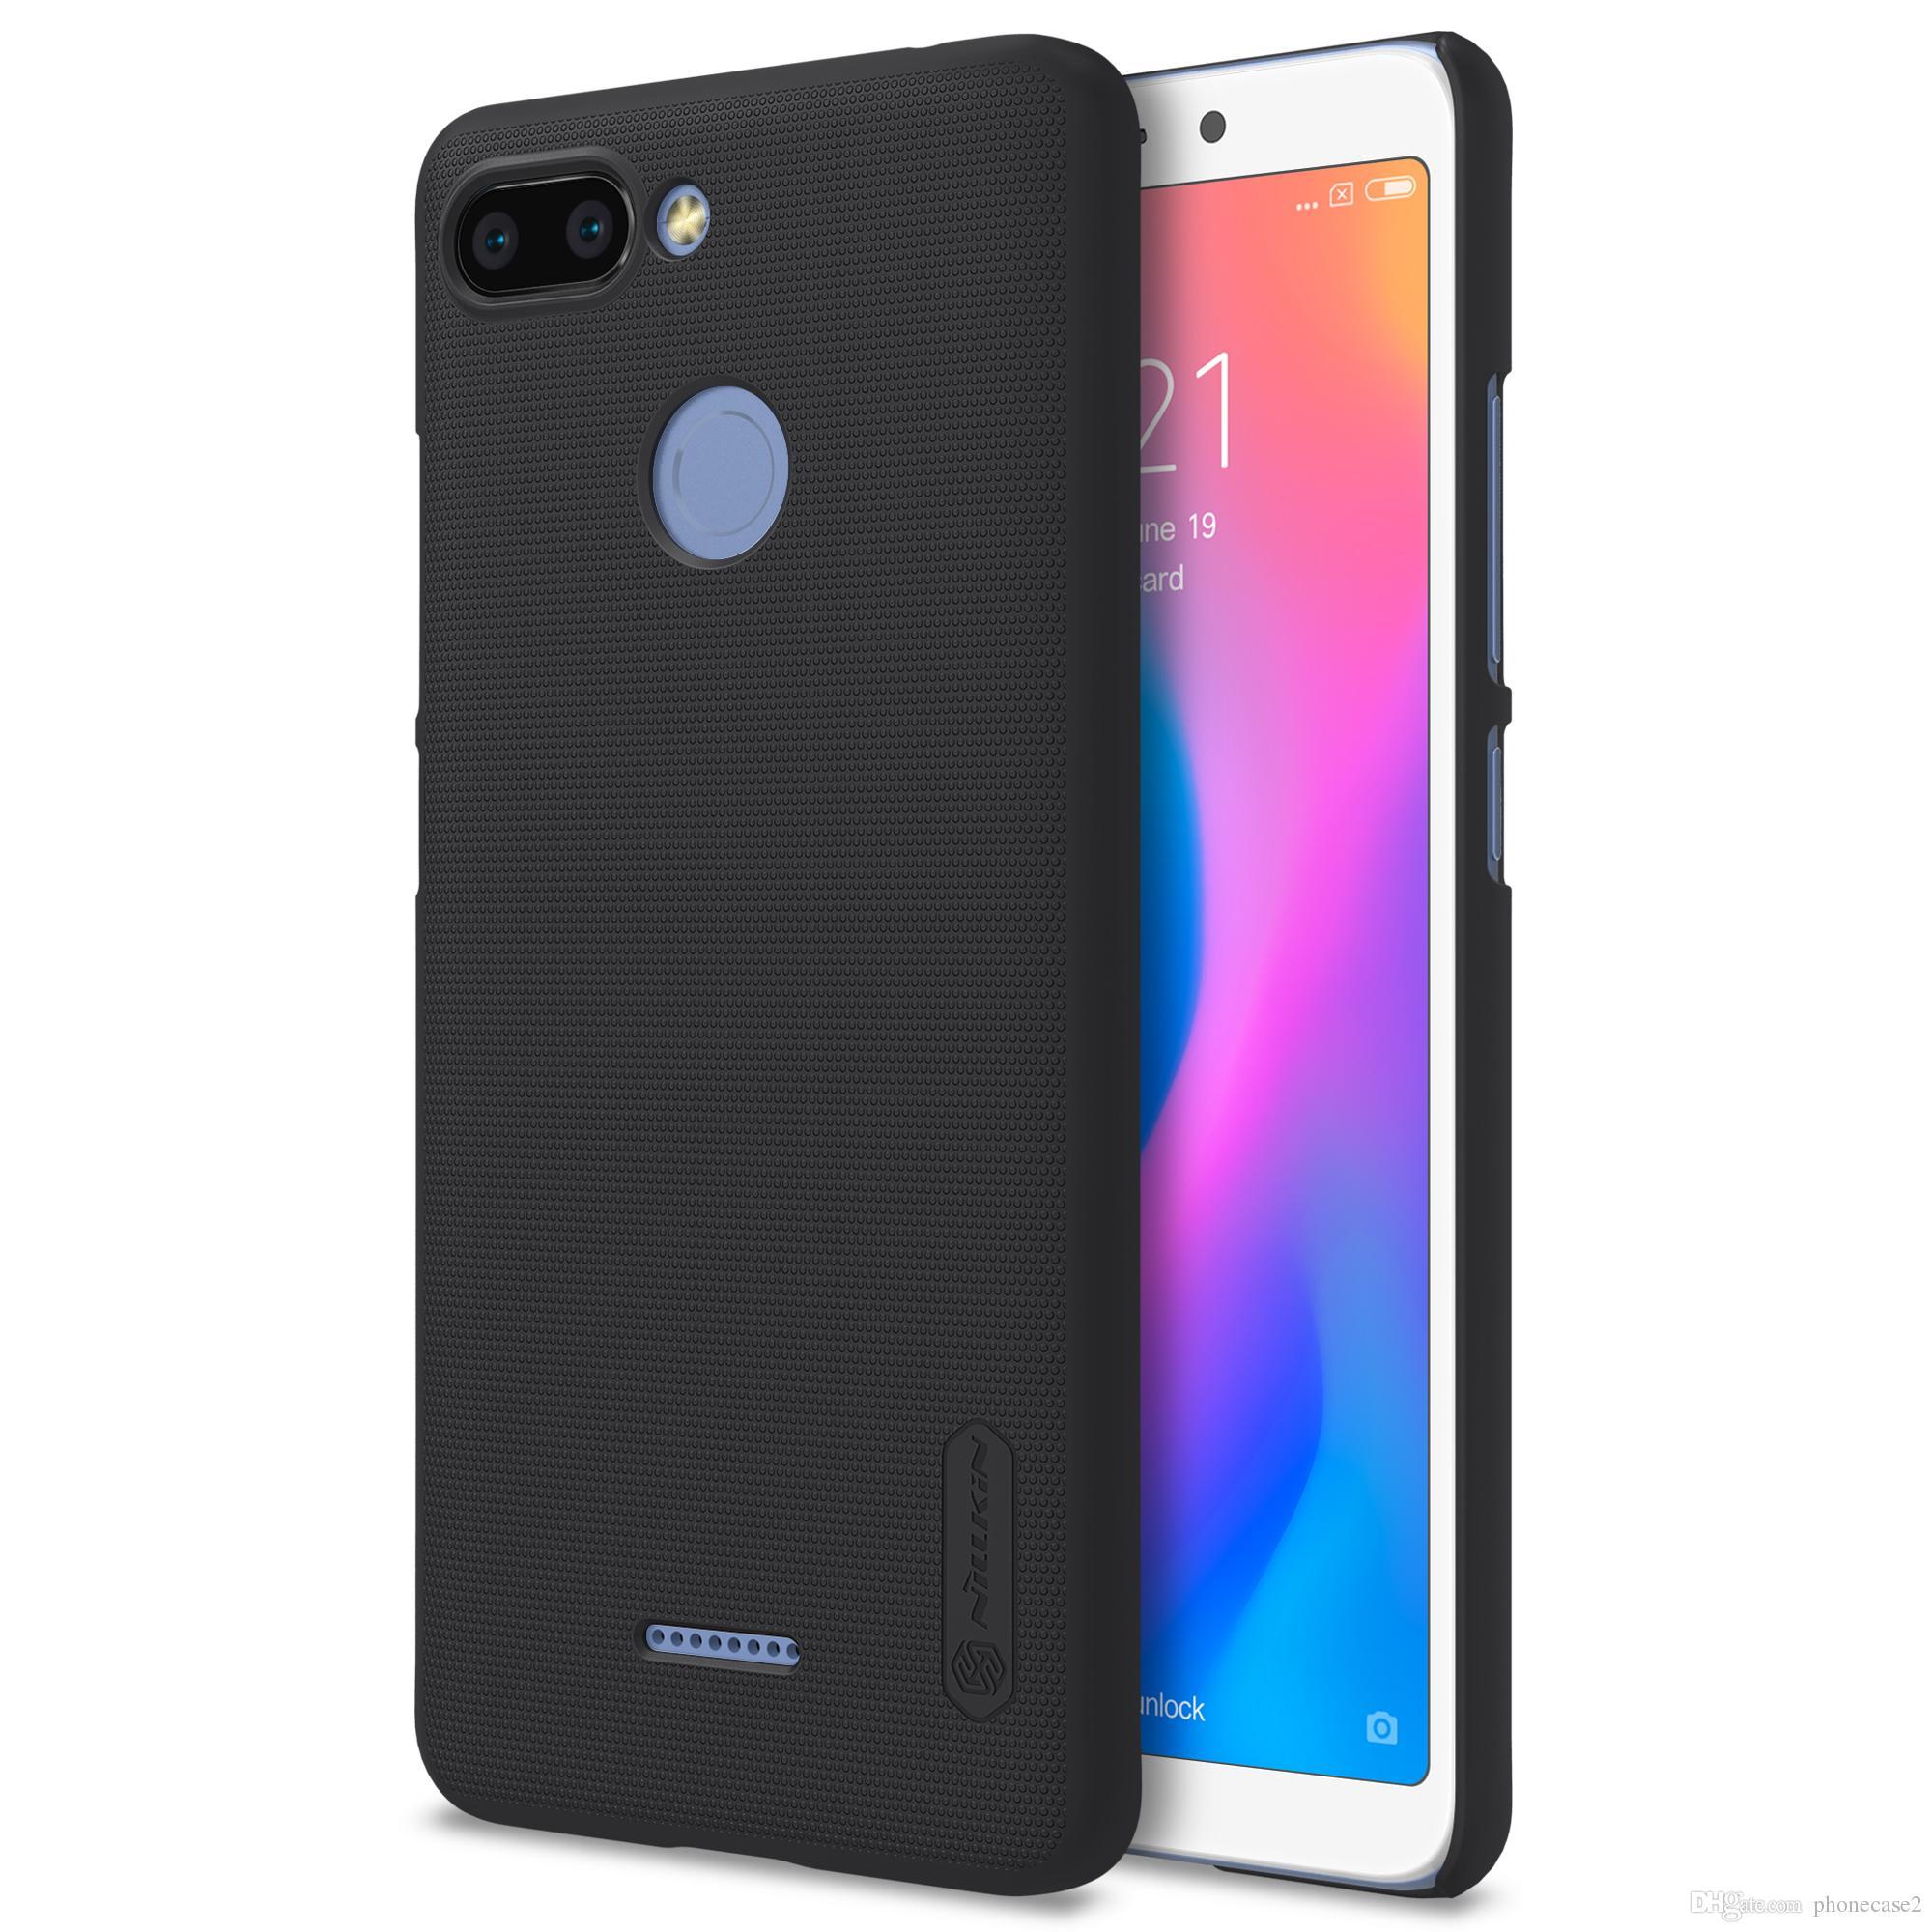 size 40 f986b 1c3a9 Xiaomi Redmi 6 Case 5.45 inch Nillkin Frosted Shield PC Back Cover Case For  Xiaomi Redmi 6 Gift Screen Protector